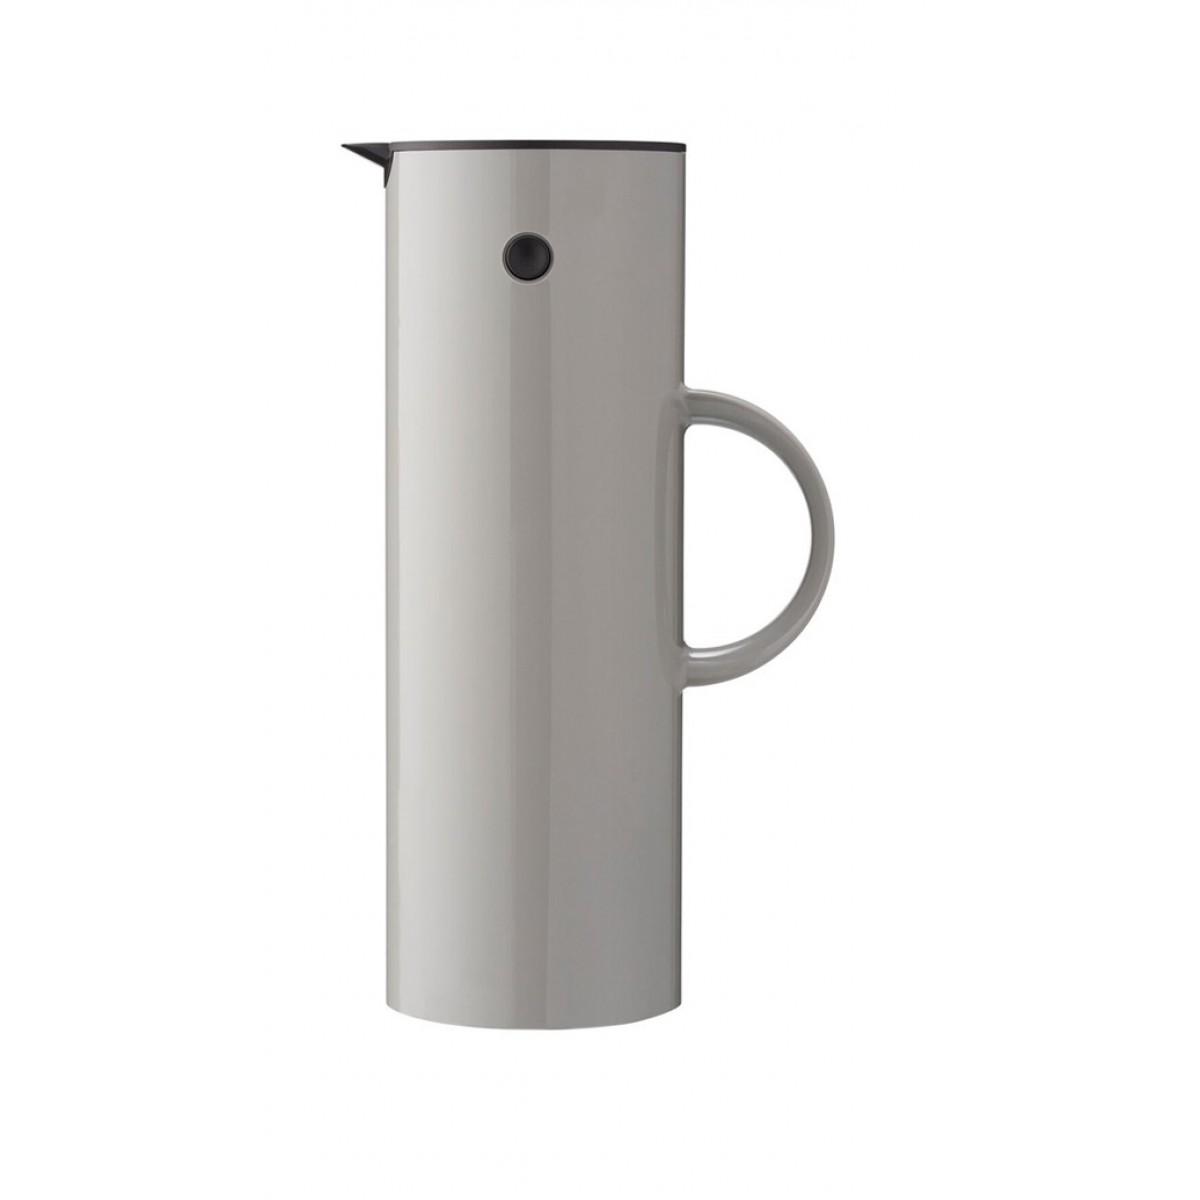 STELTON Termokande 1,0 ltr lys grå EM77